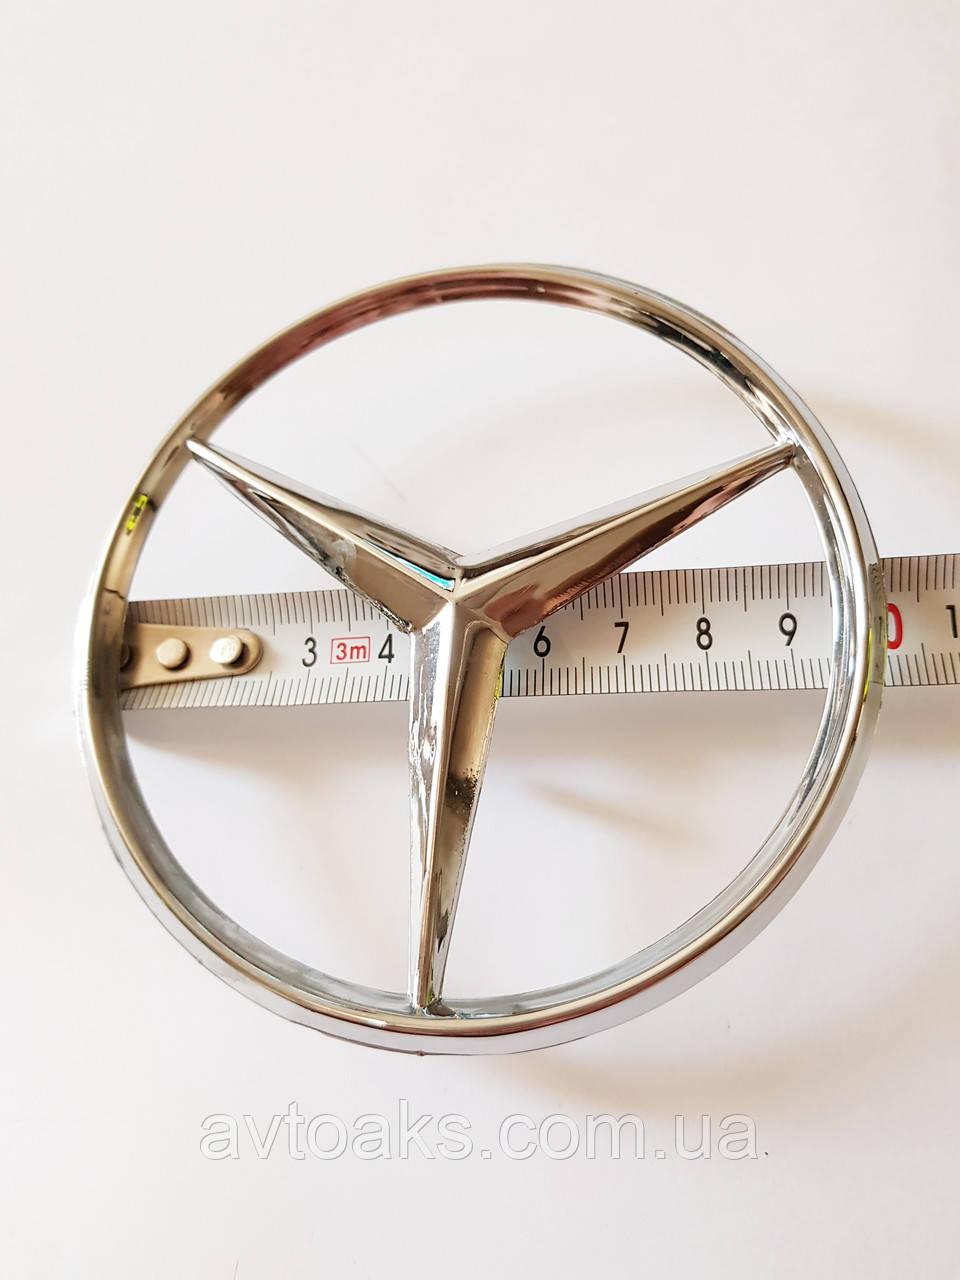 Эмблема Mercedes Vito100 мм, металл, задняя